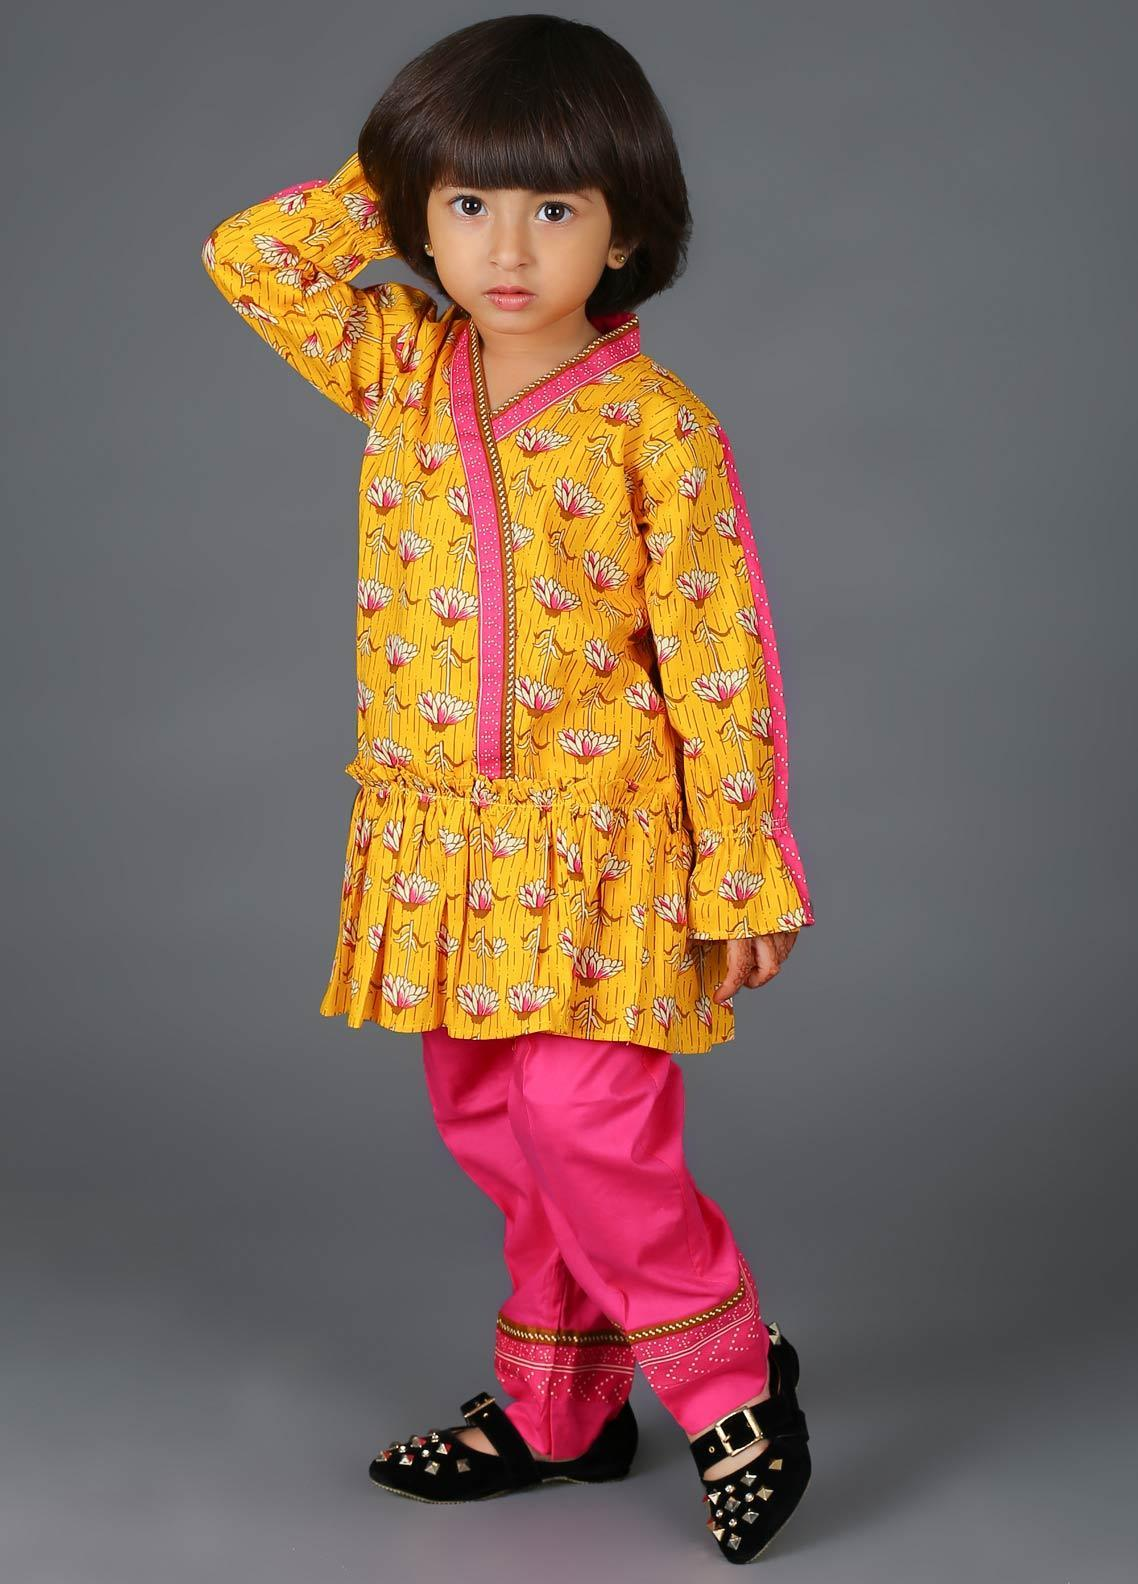 Senorita Cotton Net Fancy Girls 3 Piece Suit -  KAD-01345 YELLOW